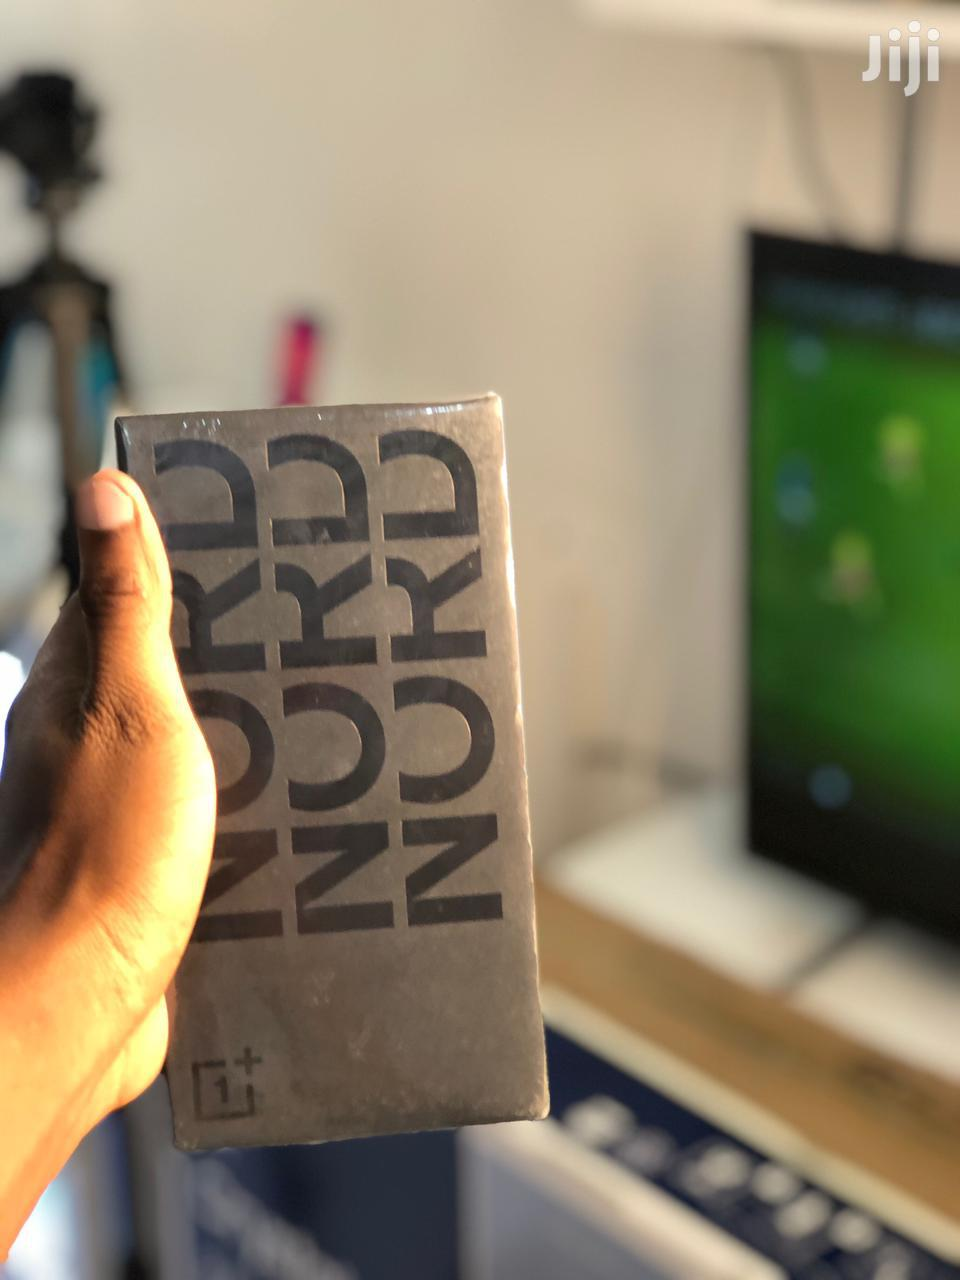 New OnePlus Nord 256 GB Black | Mobile Phones for sale in Nairobi Central, Nairobi, Kenya